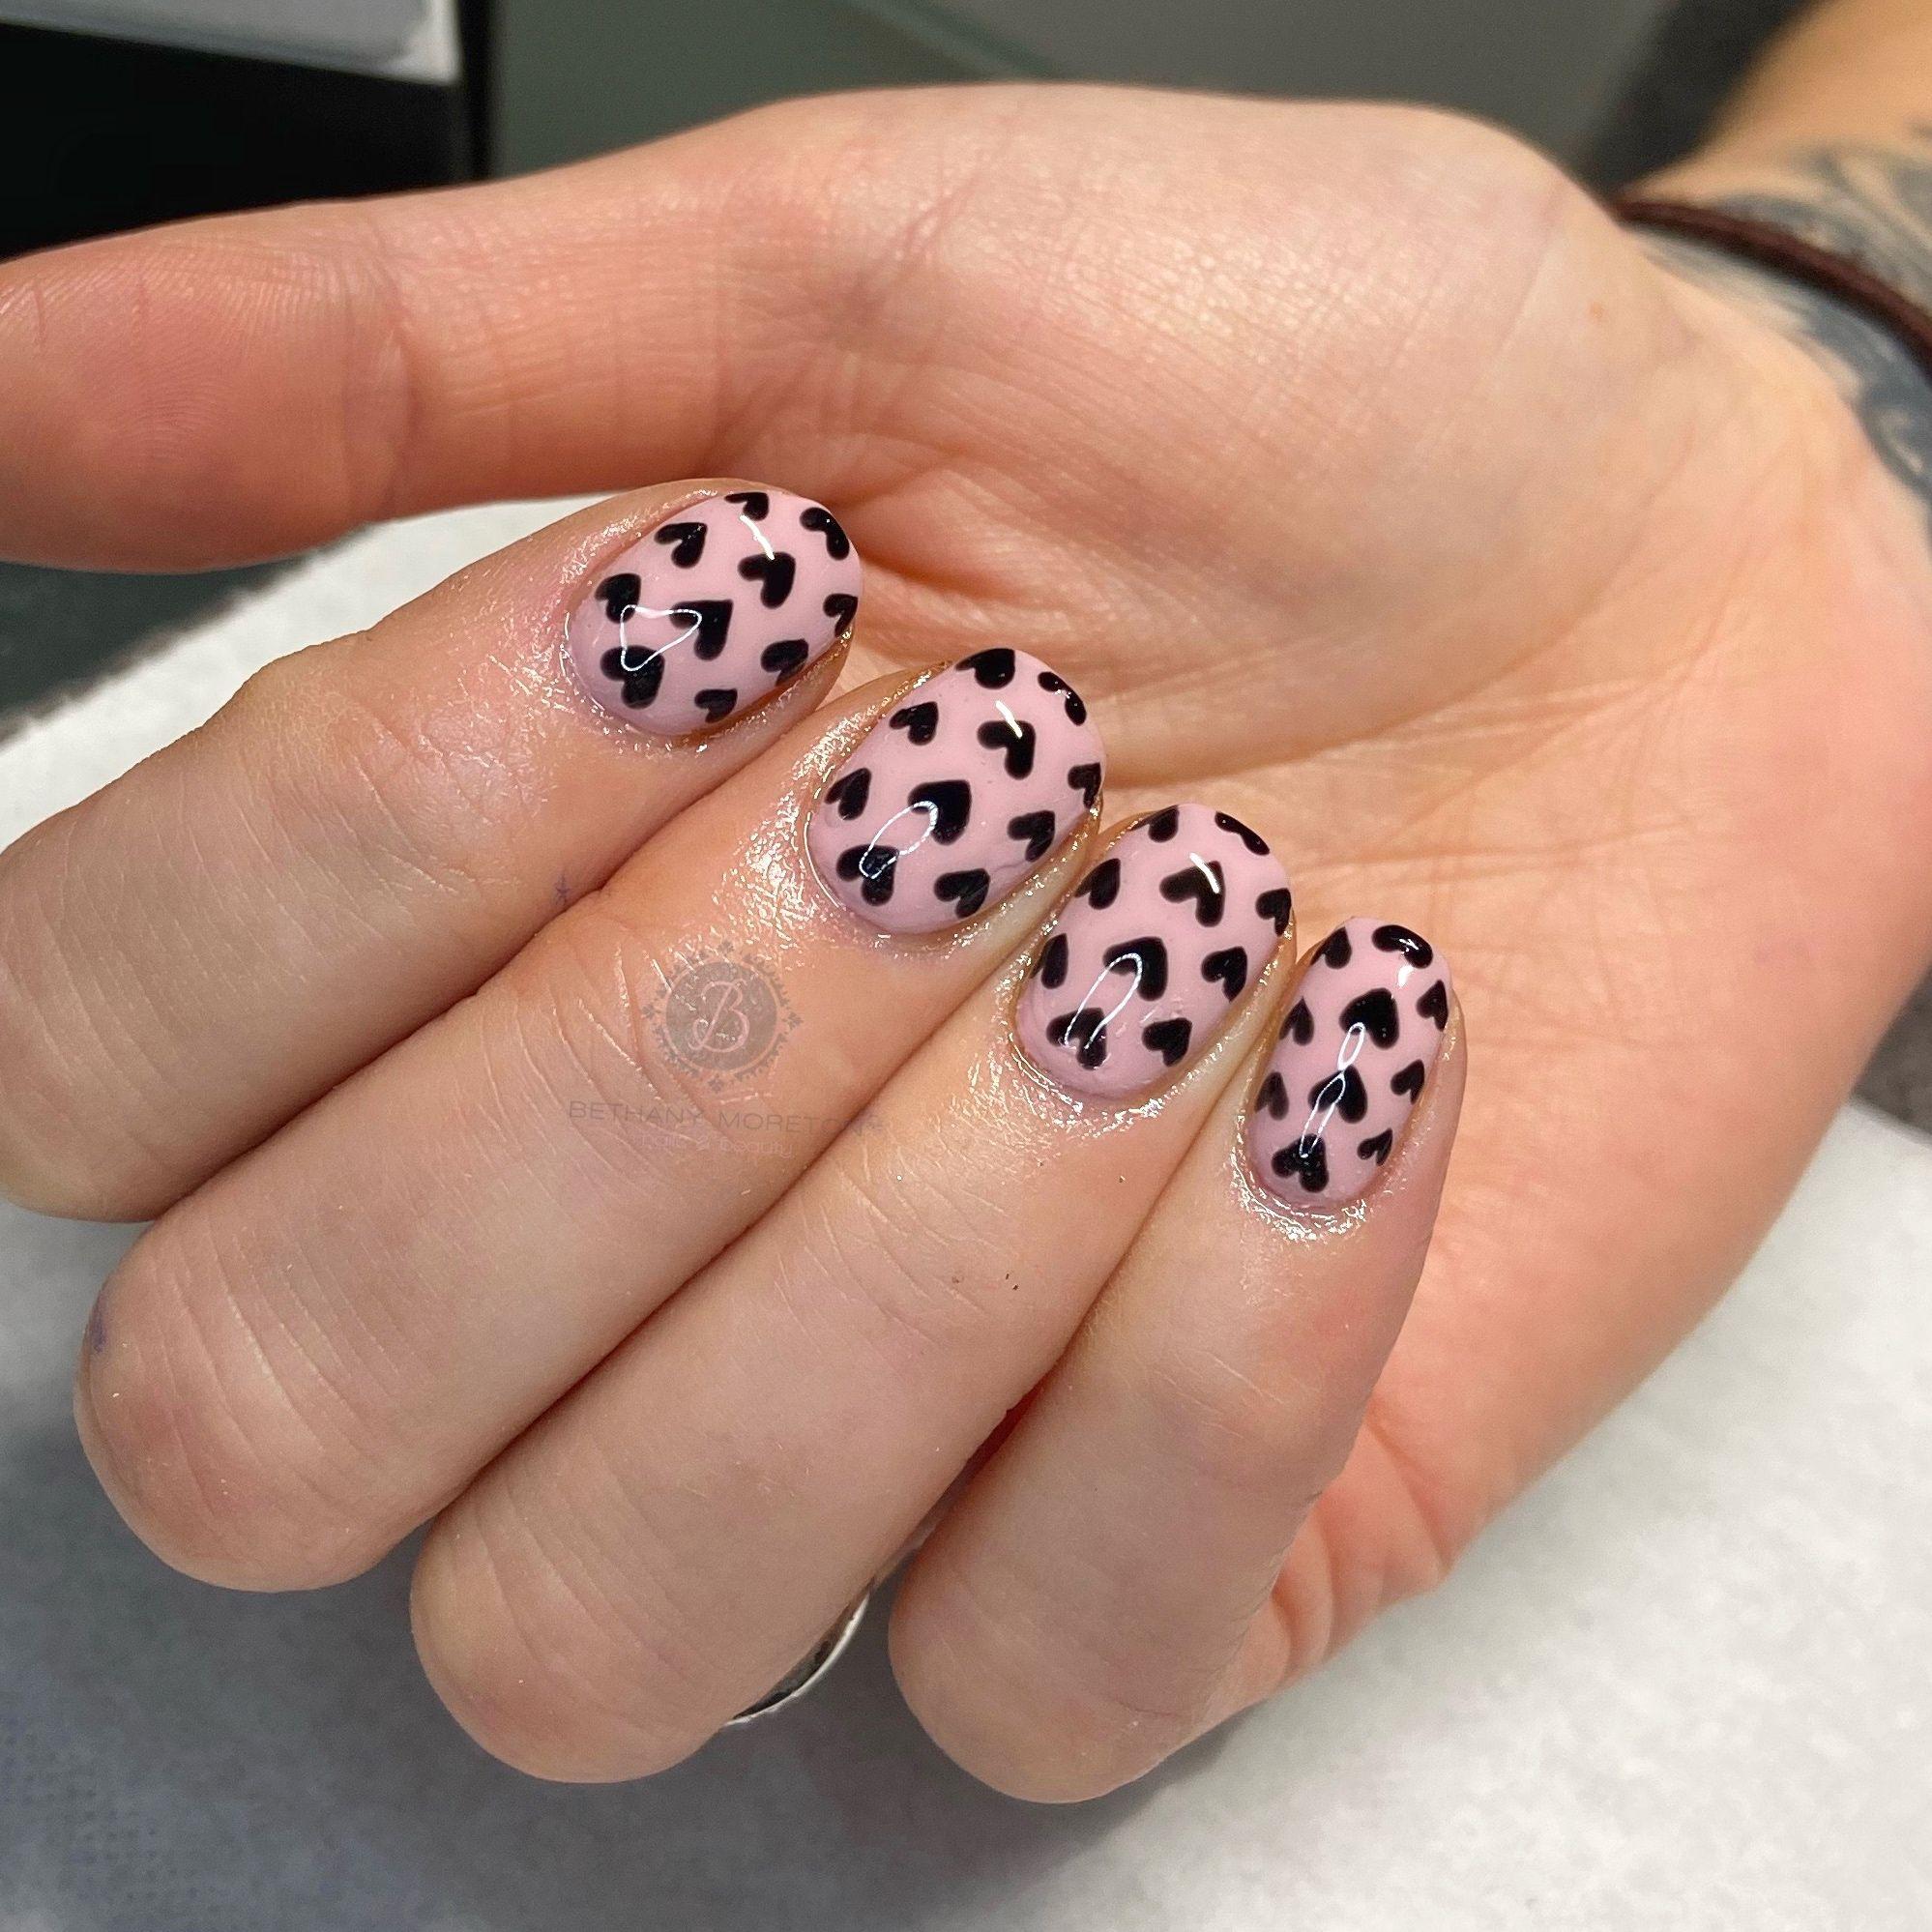 Freehand black heart valentines nails.    #nails #thegelbottle #biab #nailtech #nailsbybeff #Staffordshire #biddulph #cheshire #nailart #love #fashion #nailtechnician #scratchmagazine  #nailaddict #nailpro #showscratch #polish #nailfie #nailartist